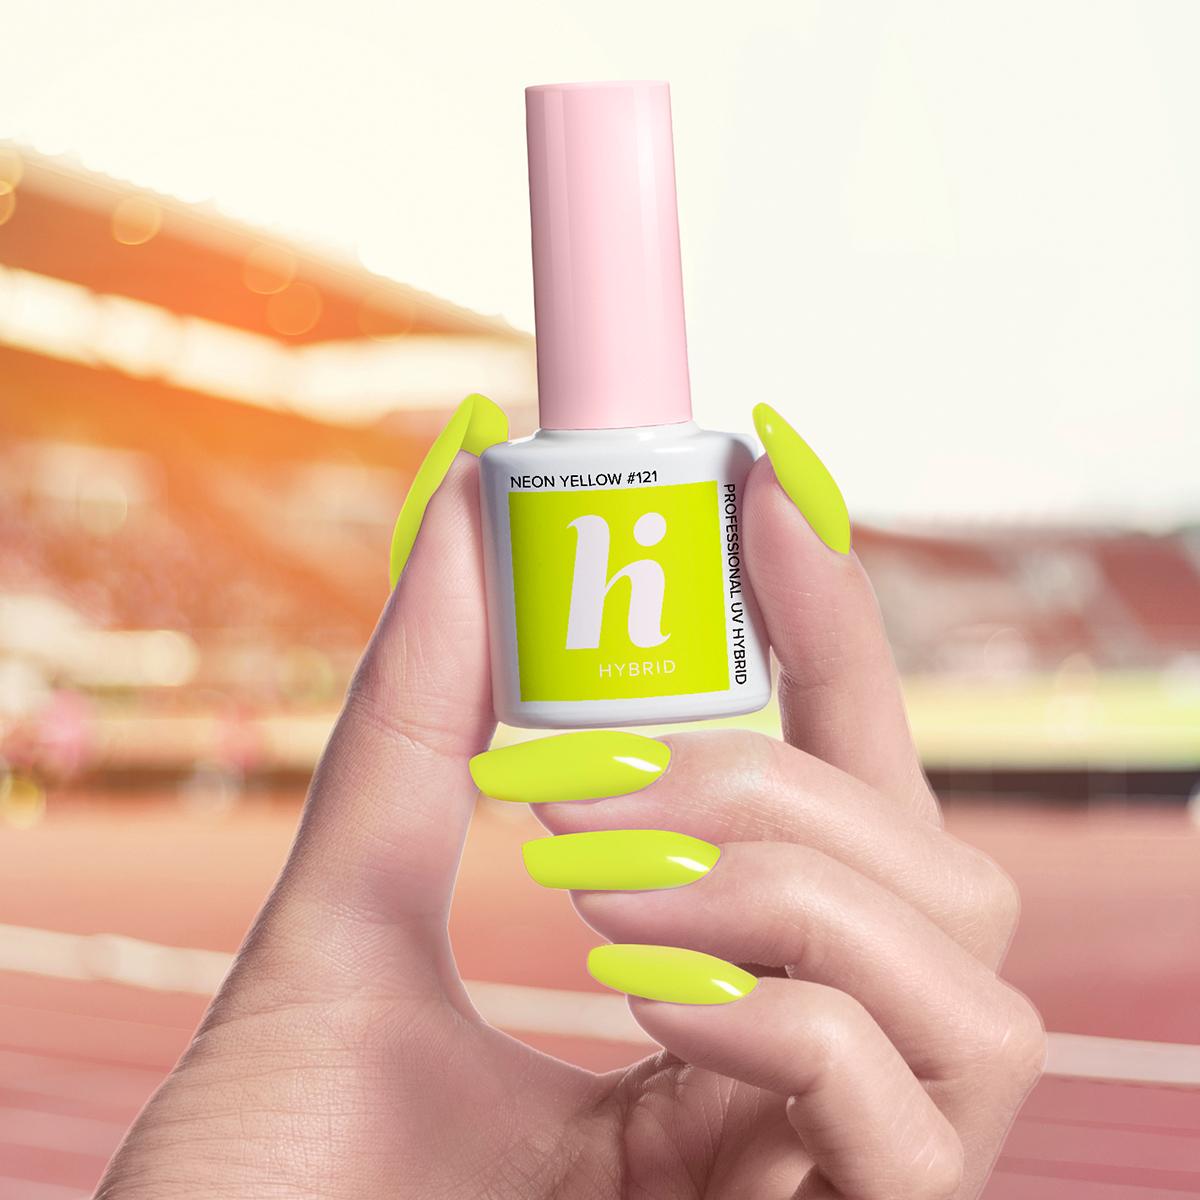 121 lakier hi hybrid neon yellow 5ml